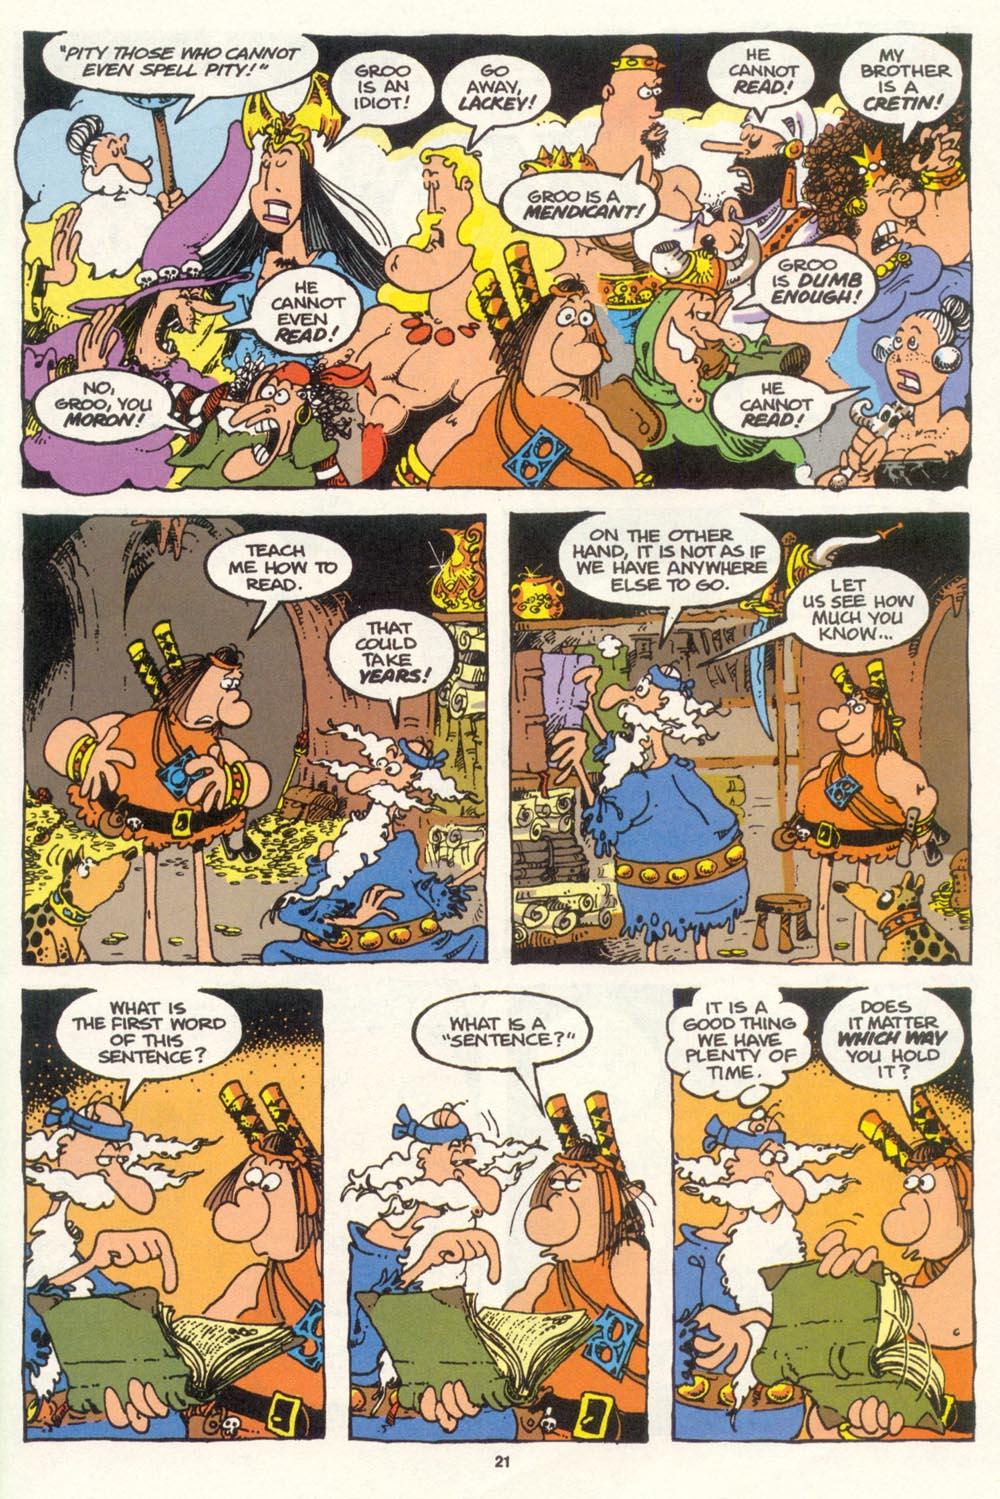 Read online Sergio Aragonés Groo the Wanderer comic -  Issue #100 - 22